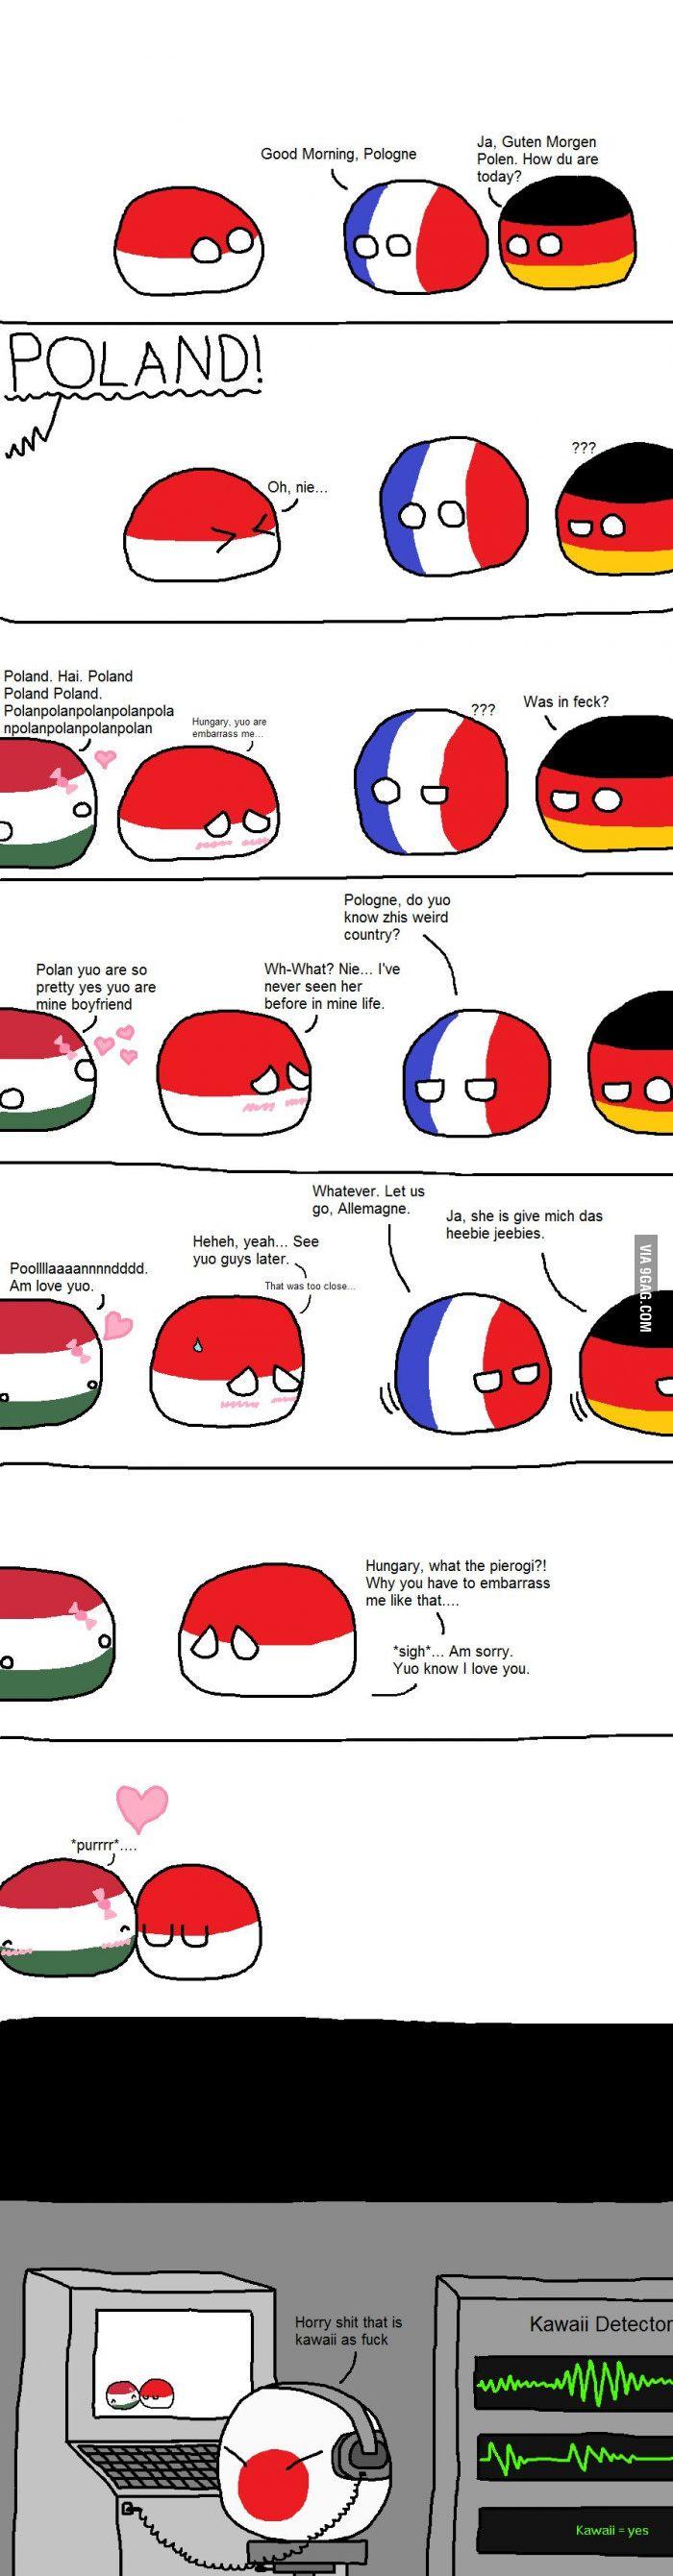 Poland's secret